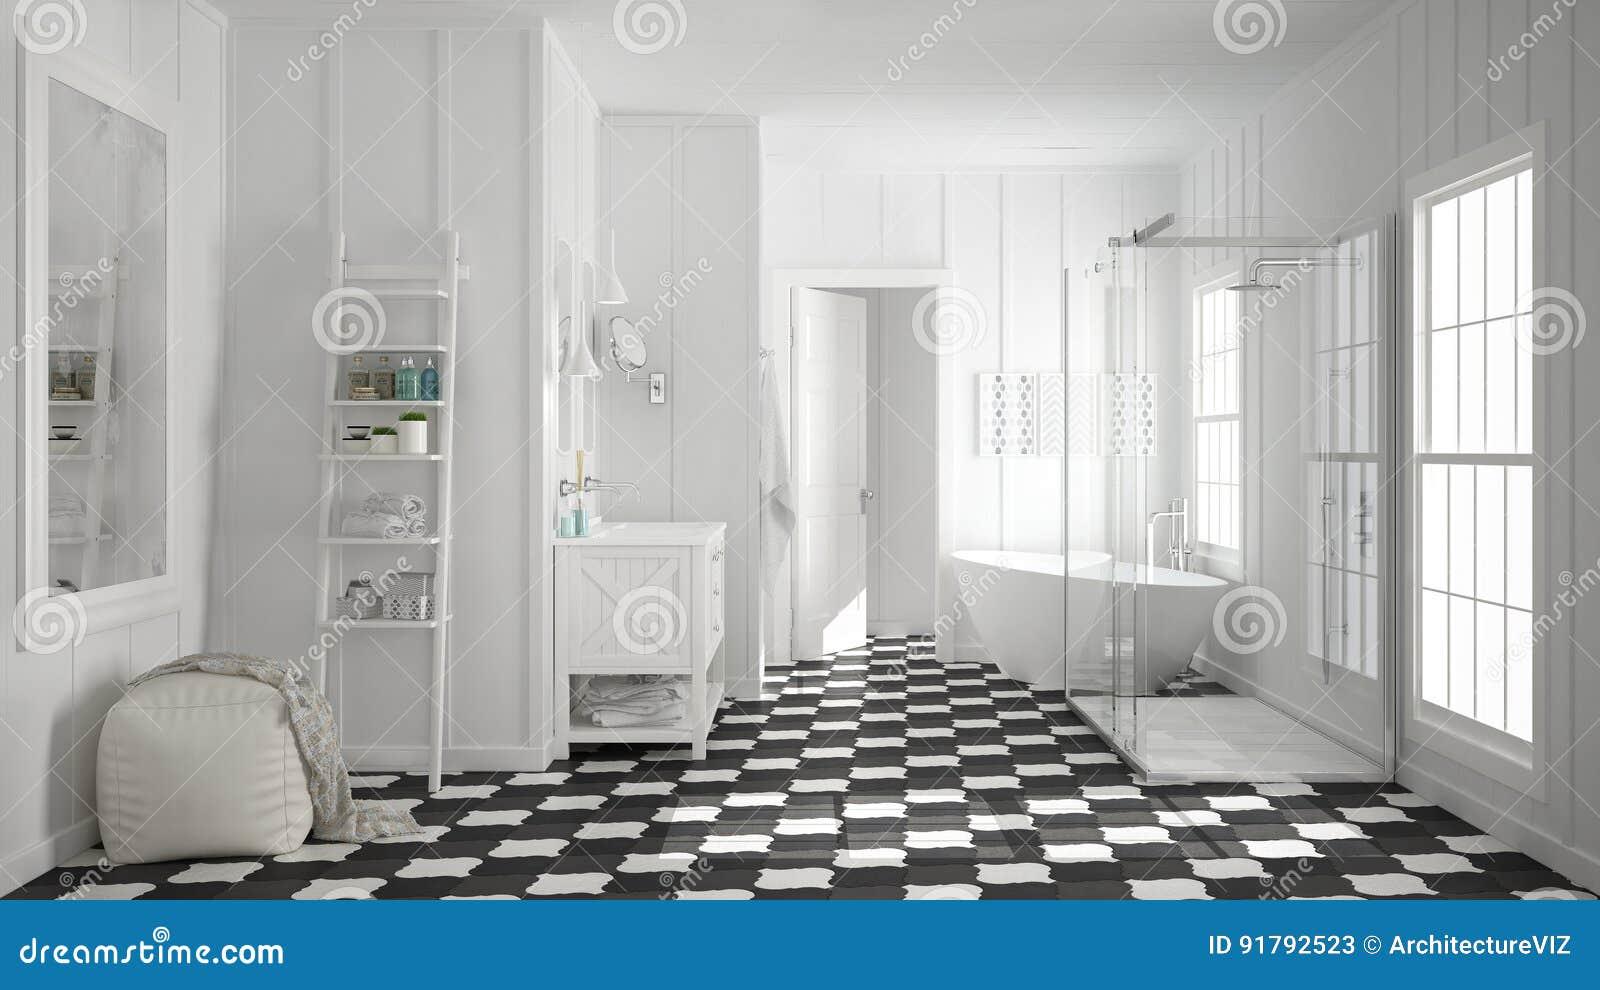 Bagno Design Scandinavo : Bagno bianco e grigio minimalista scandinavo doccia vasca